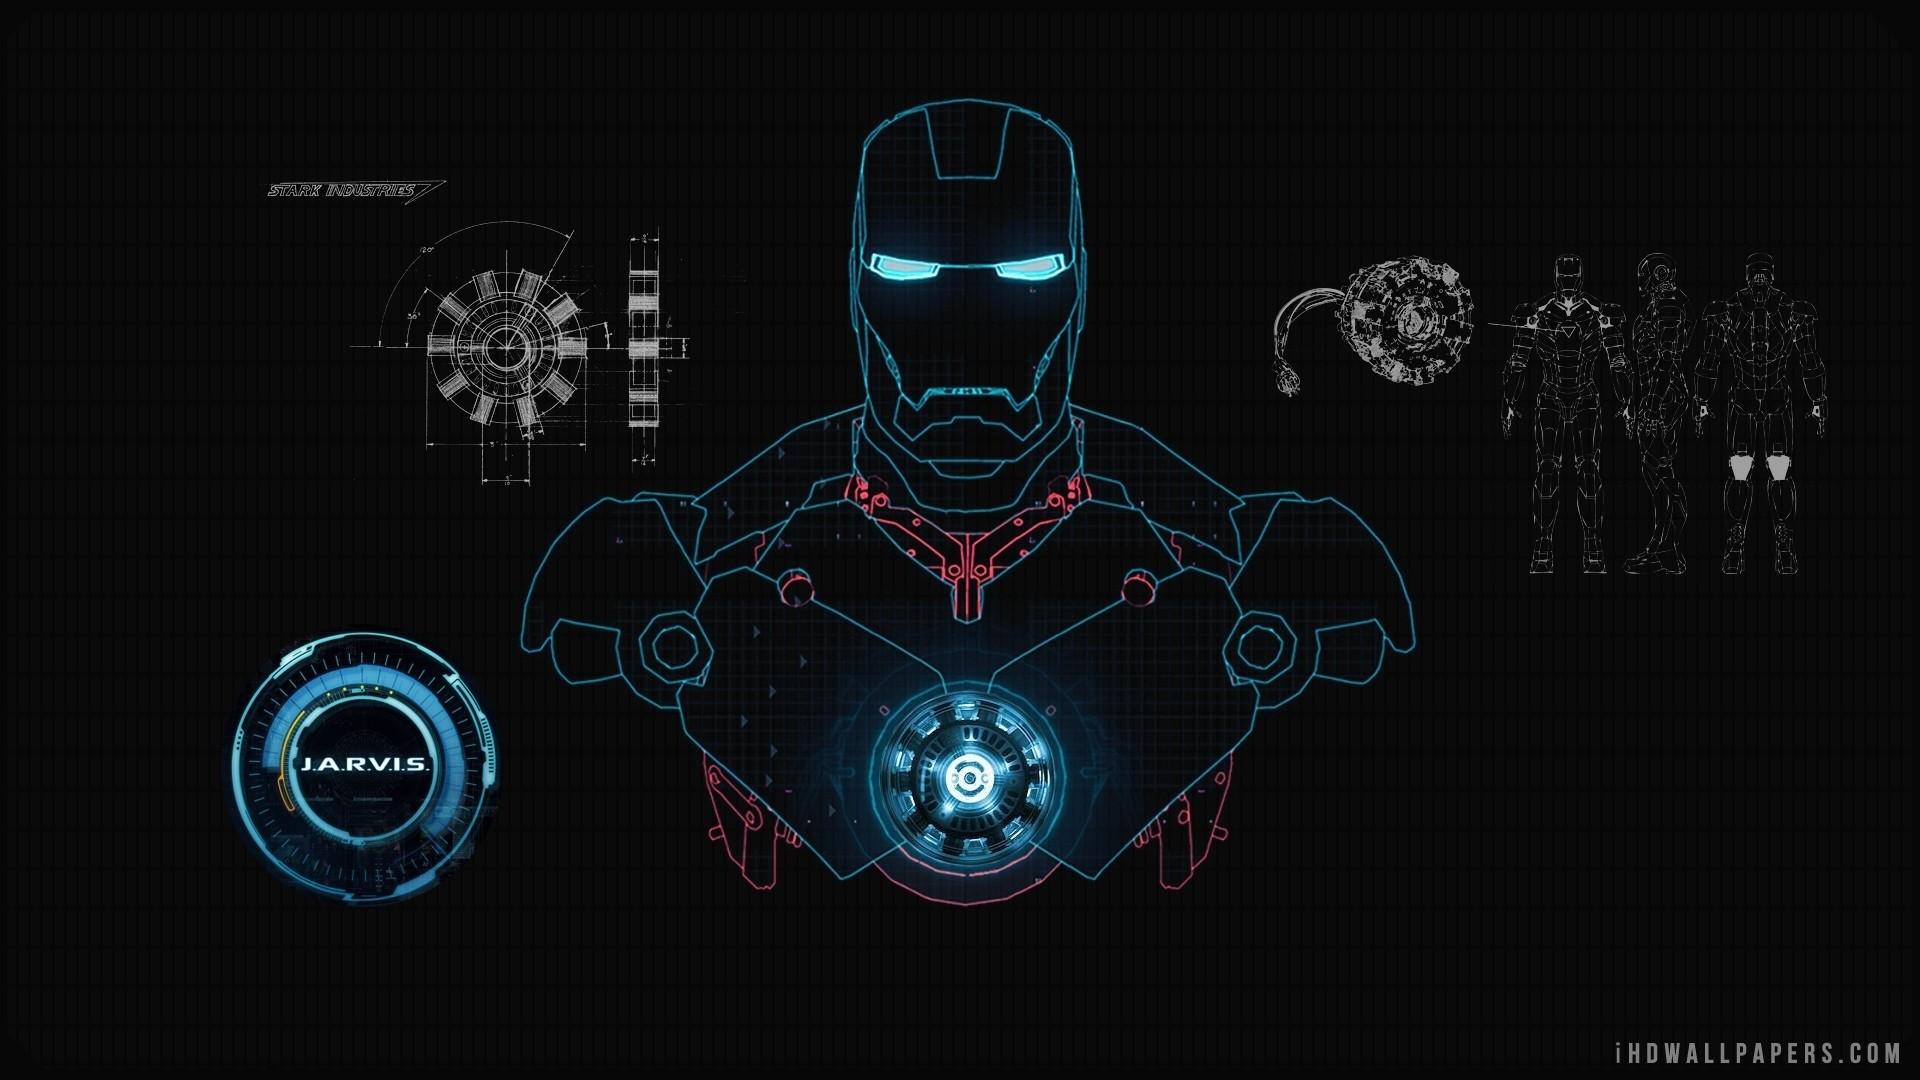 Iron Man JARVIS HD Wallpaper – iHD Wallpapers